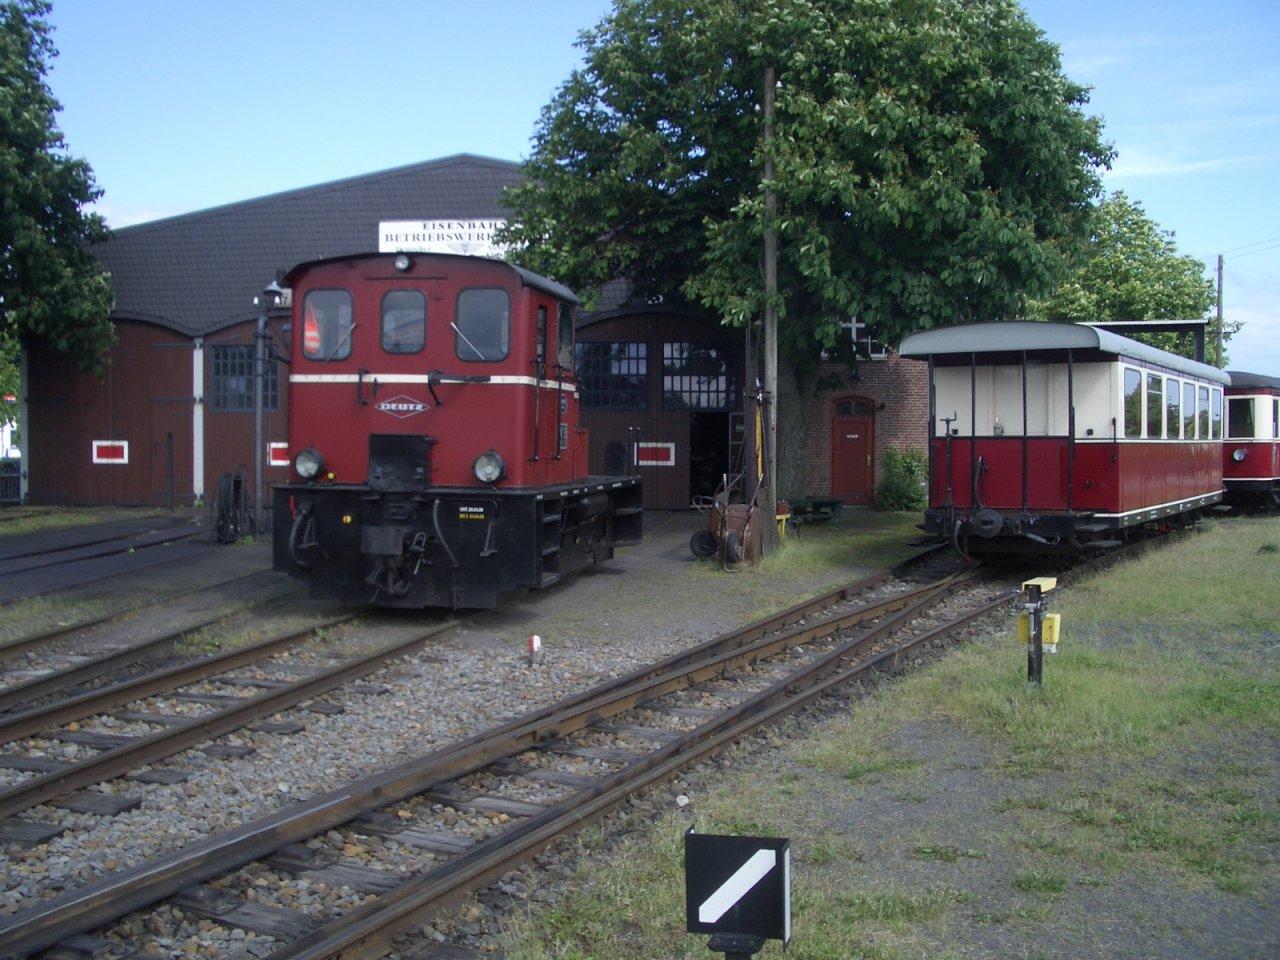 BruchhsnVilsen2013VI15 (4).JPG